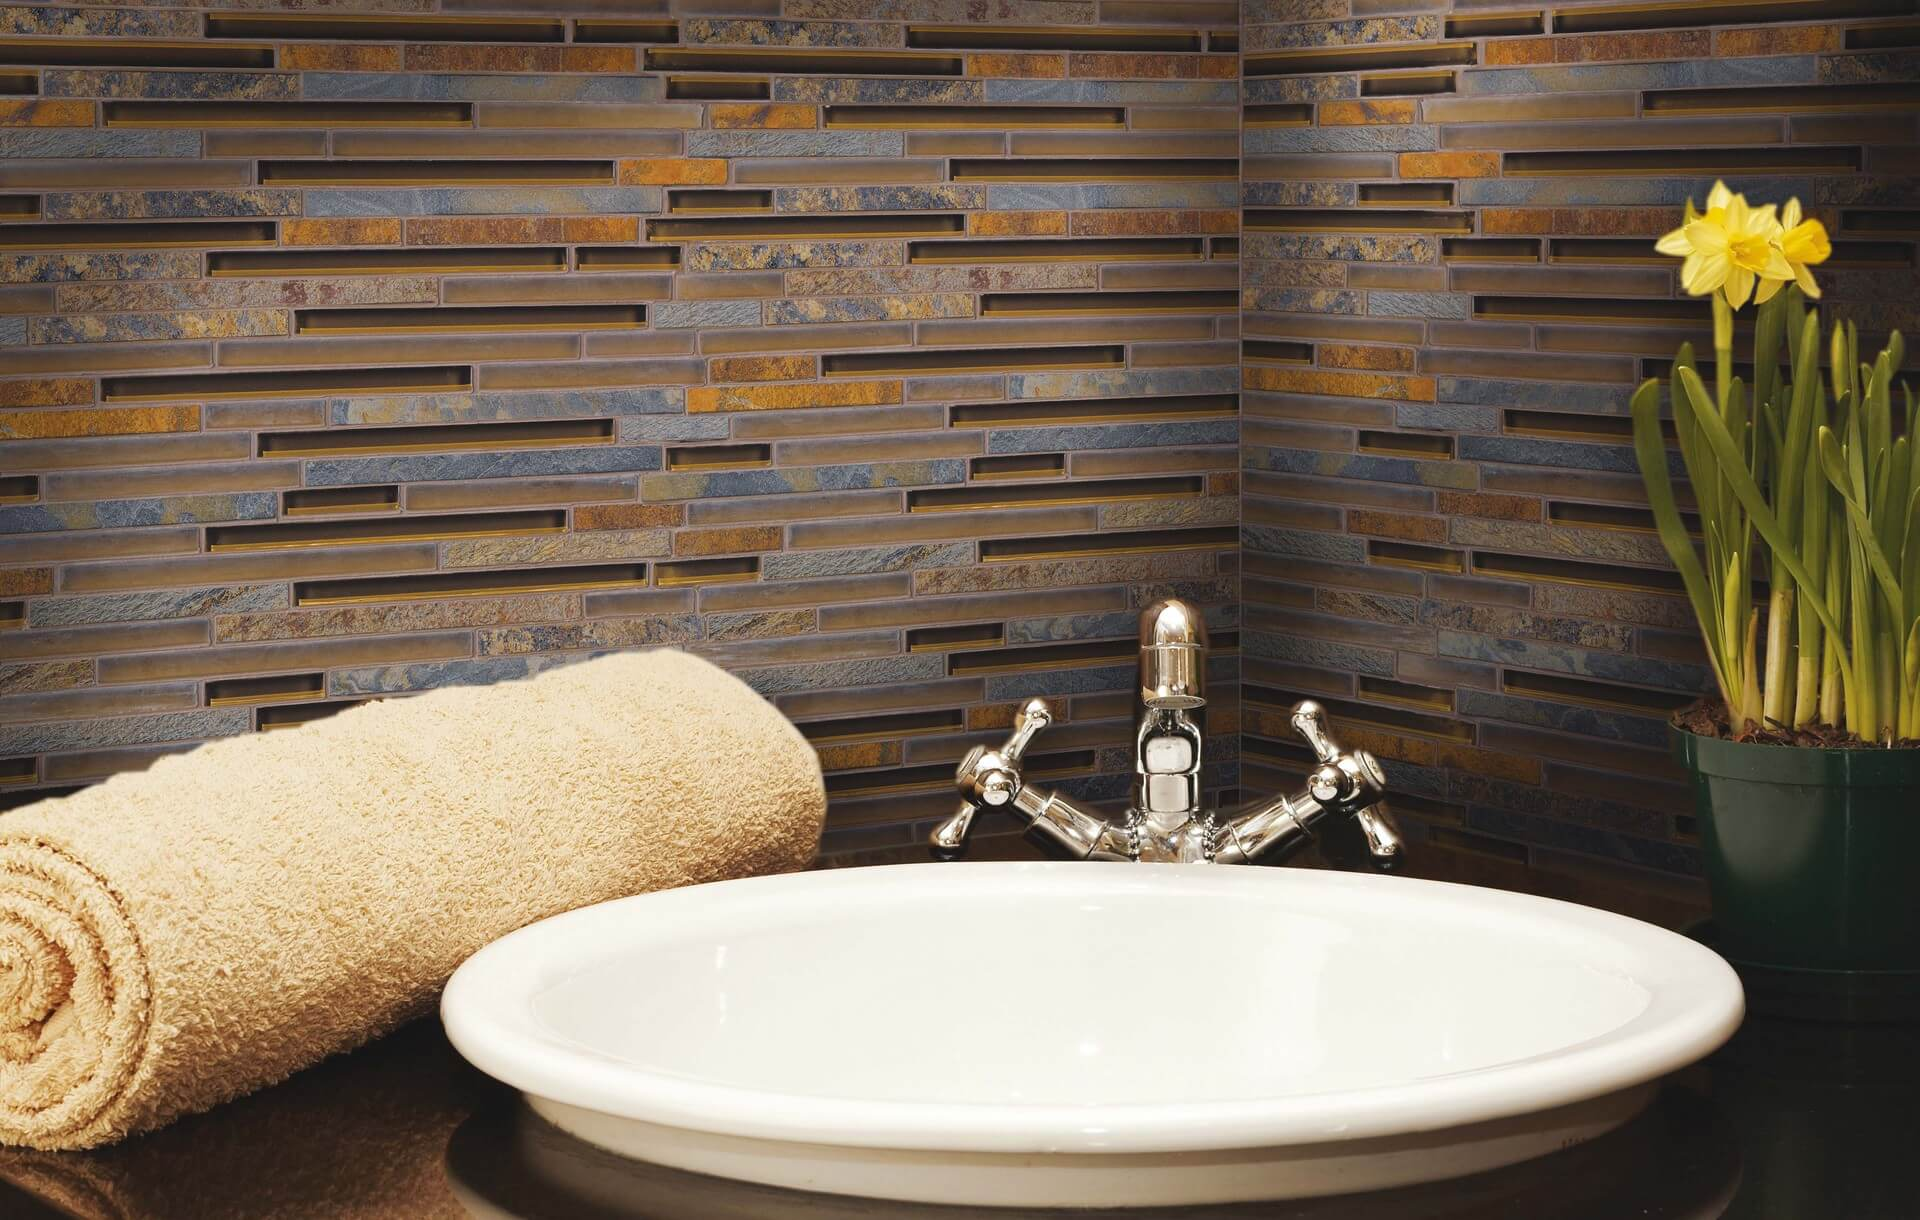 Ice rocks california gold blend bathroom tiles by Fran-Char